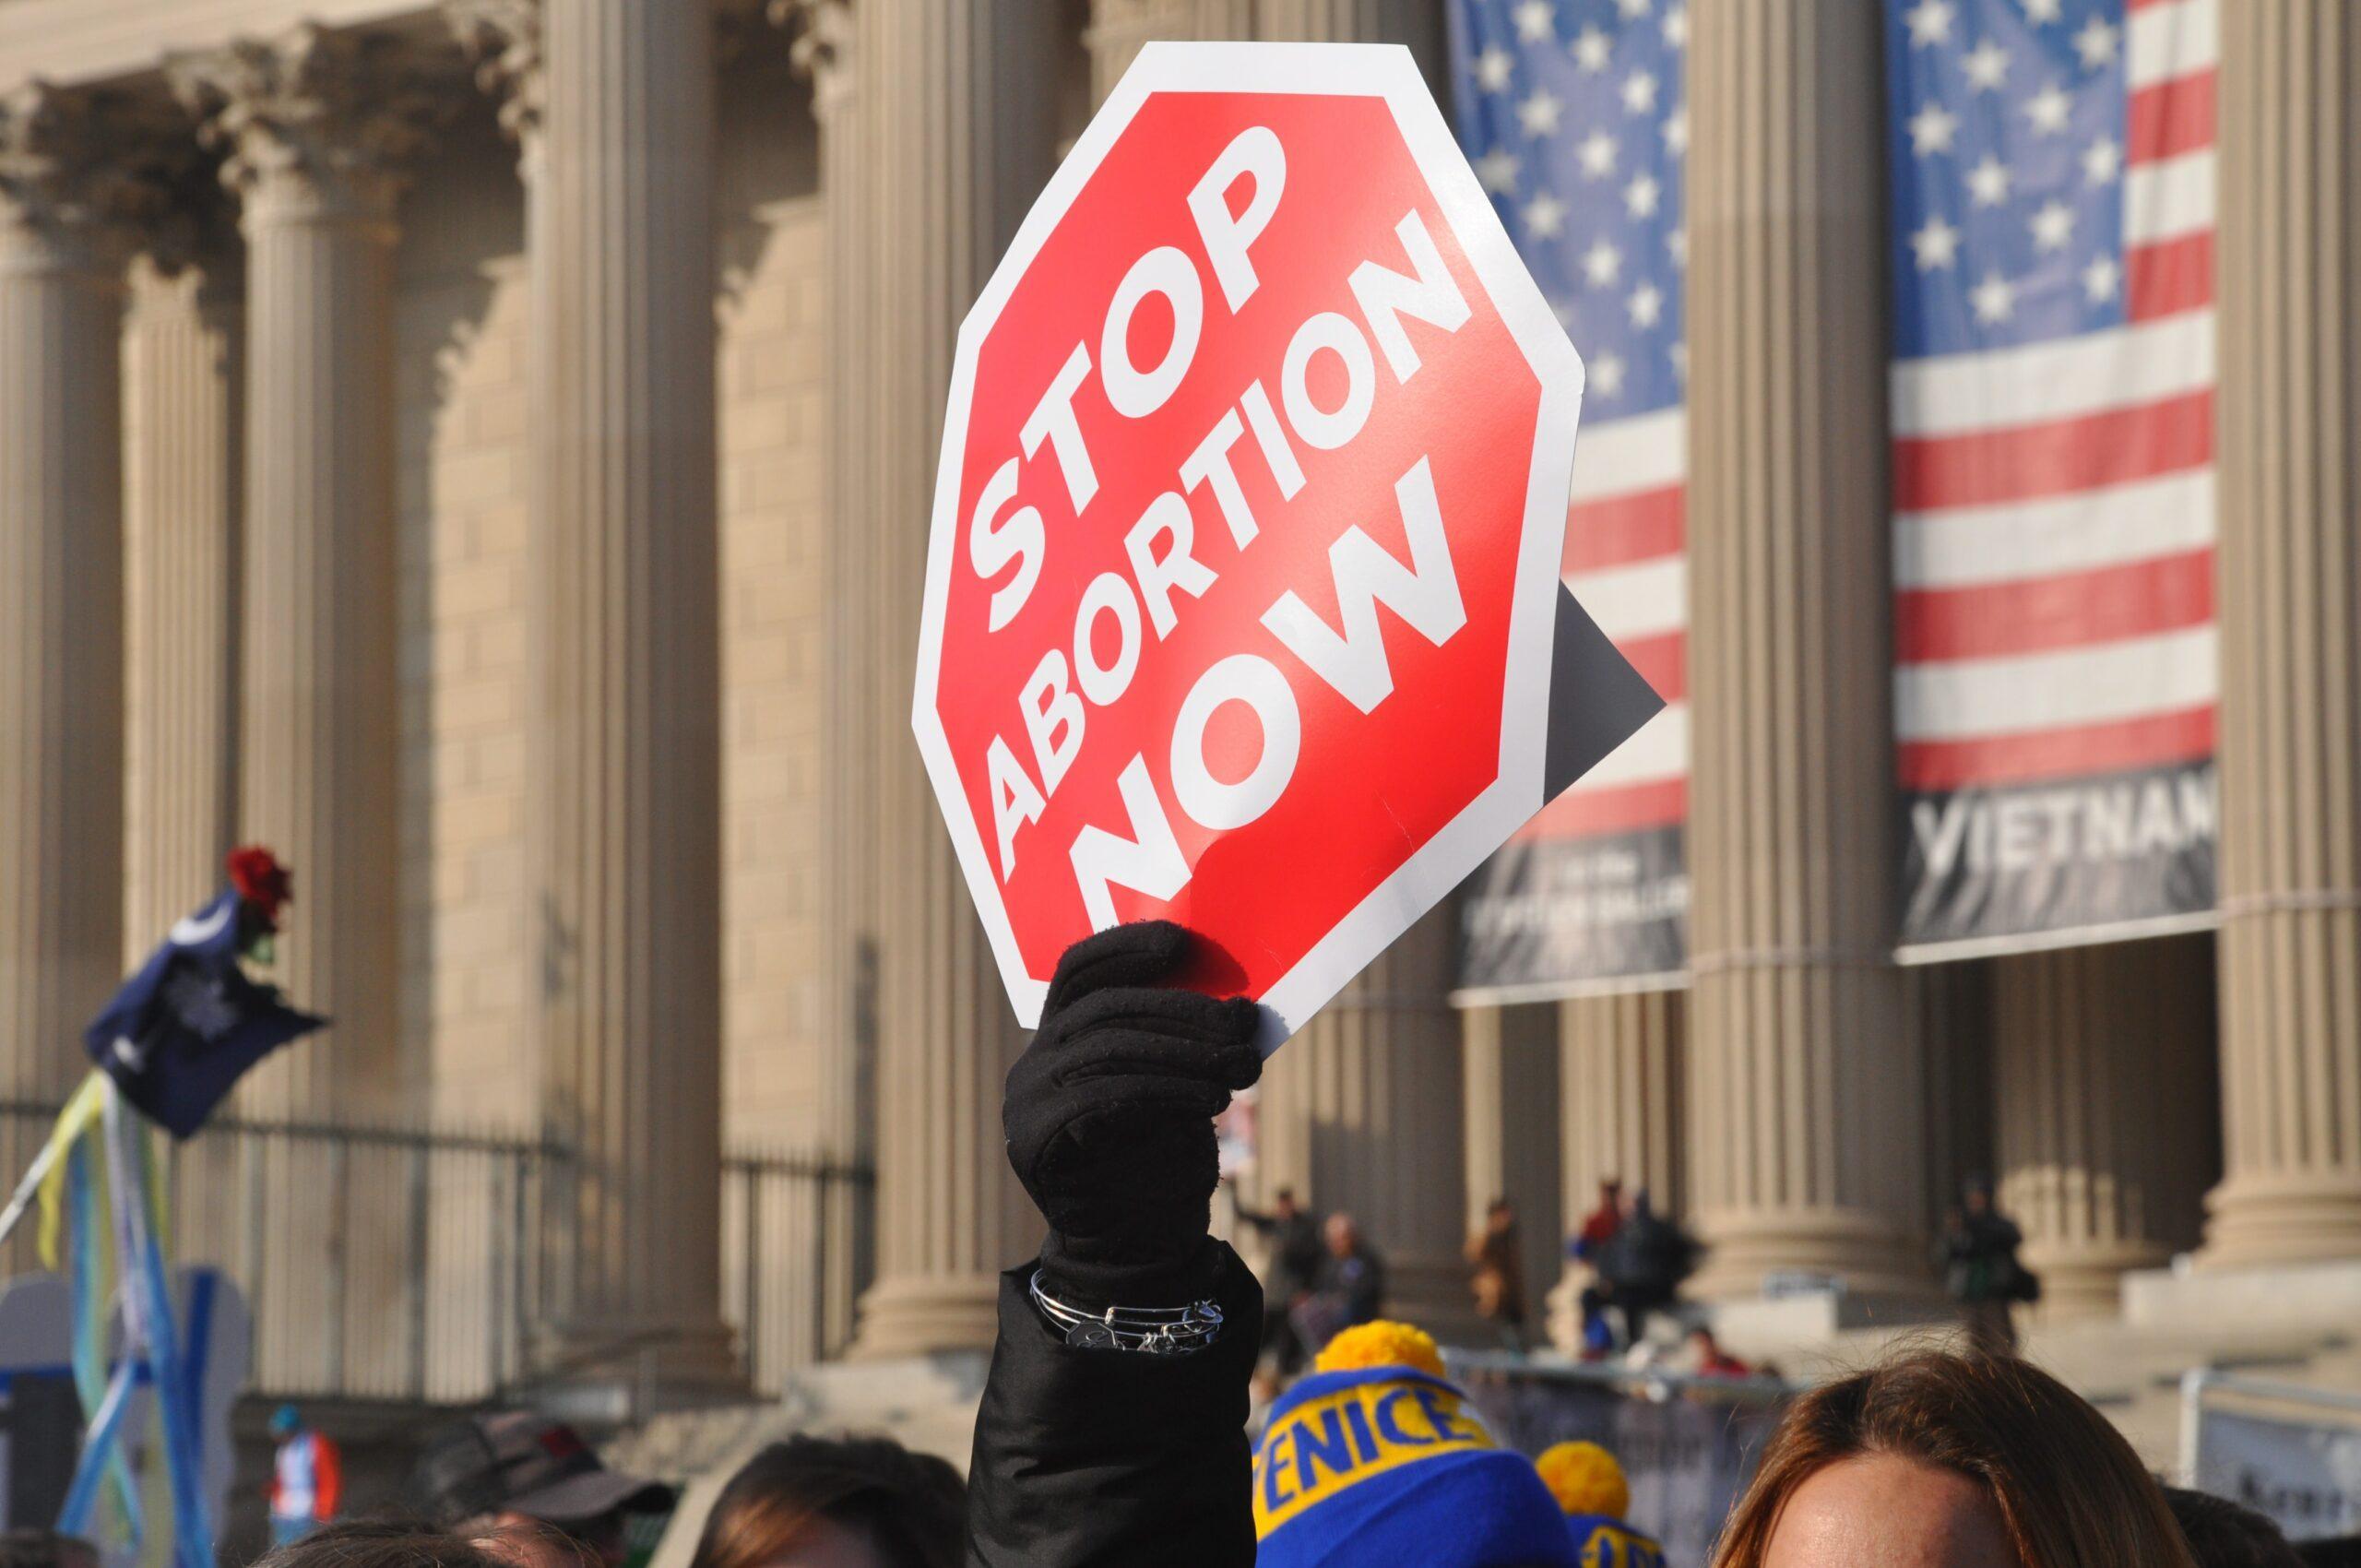 Posicionamento de Amy Coney Barrett contra o aborto